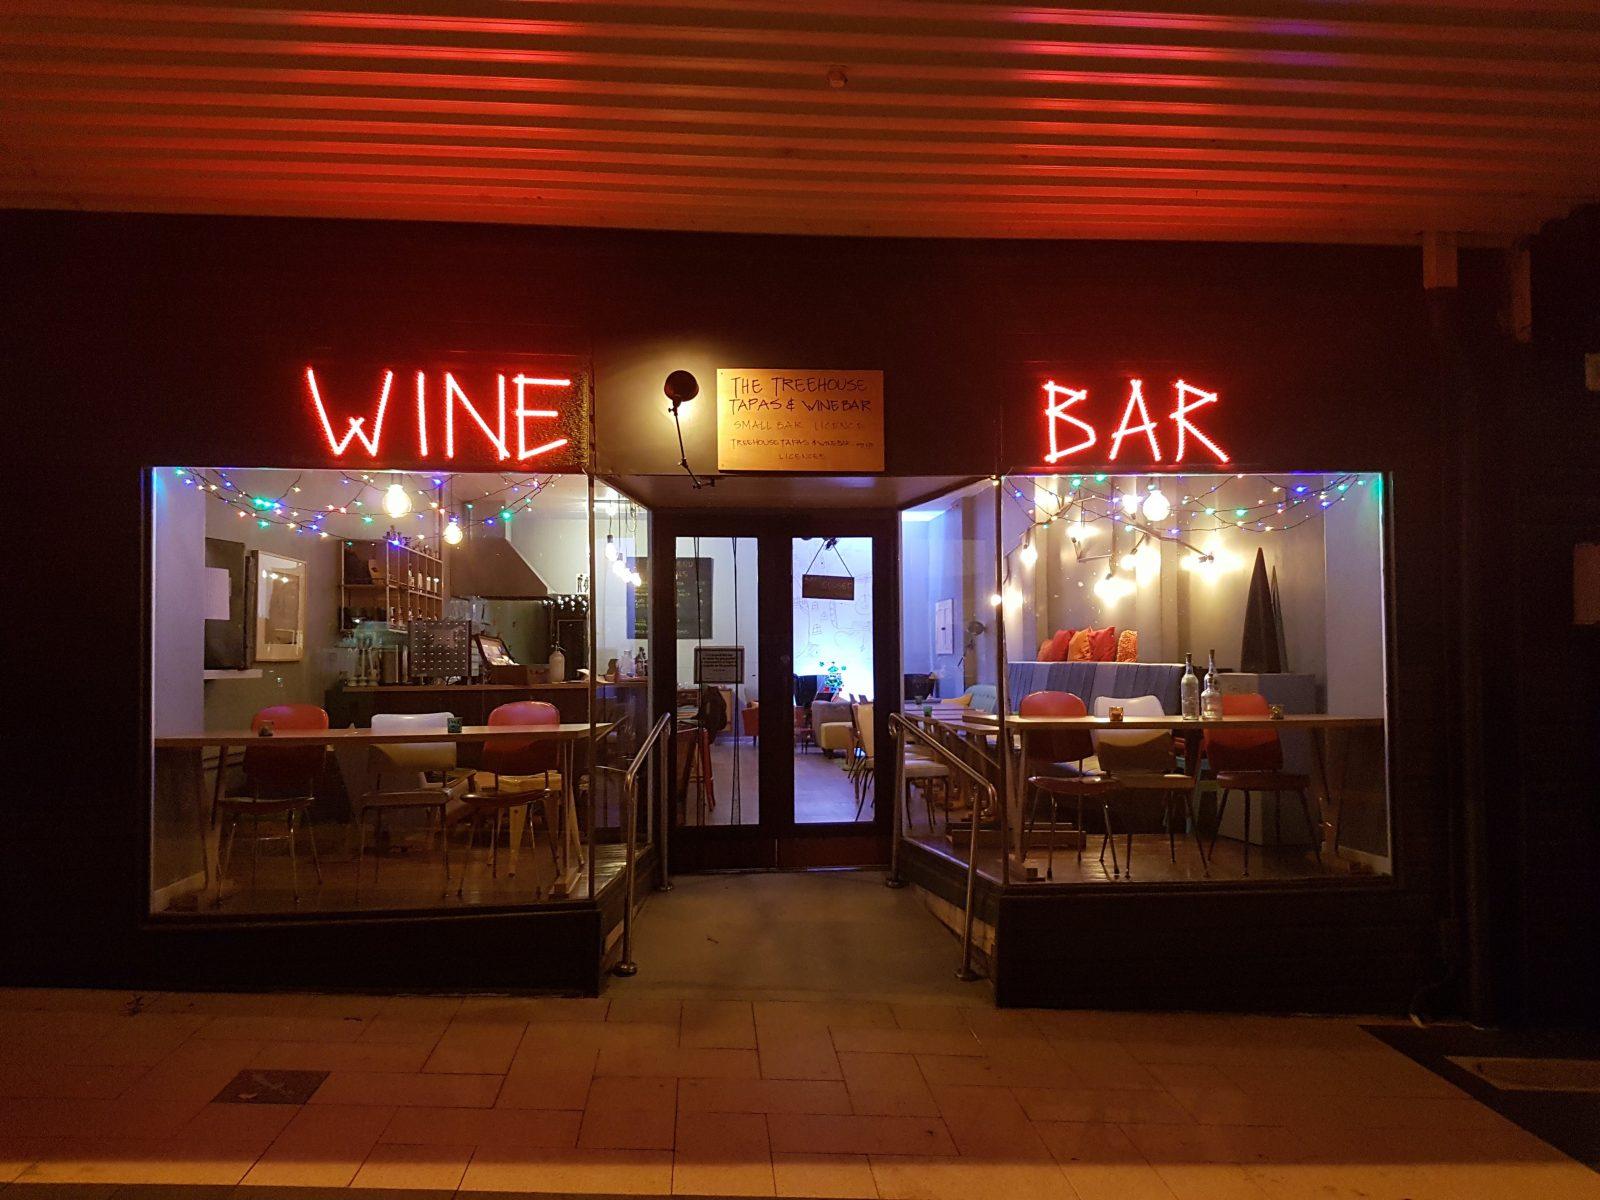 Treehouse Tapas and Wine Bar, Pemberton, Western Australia